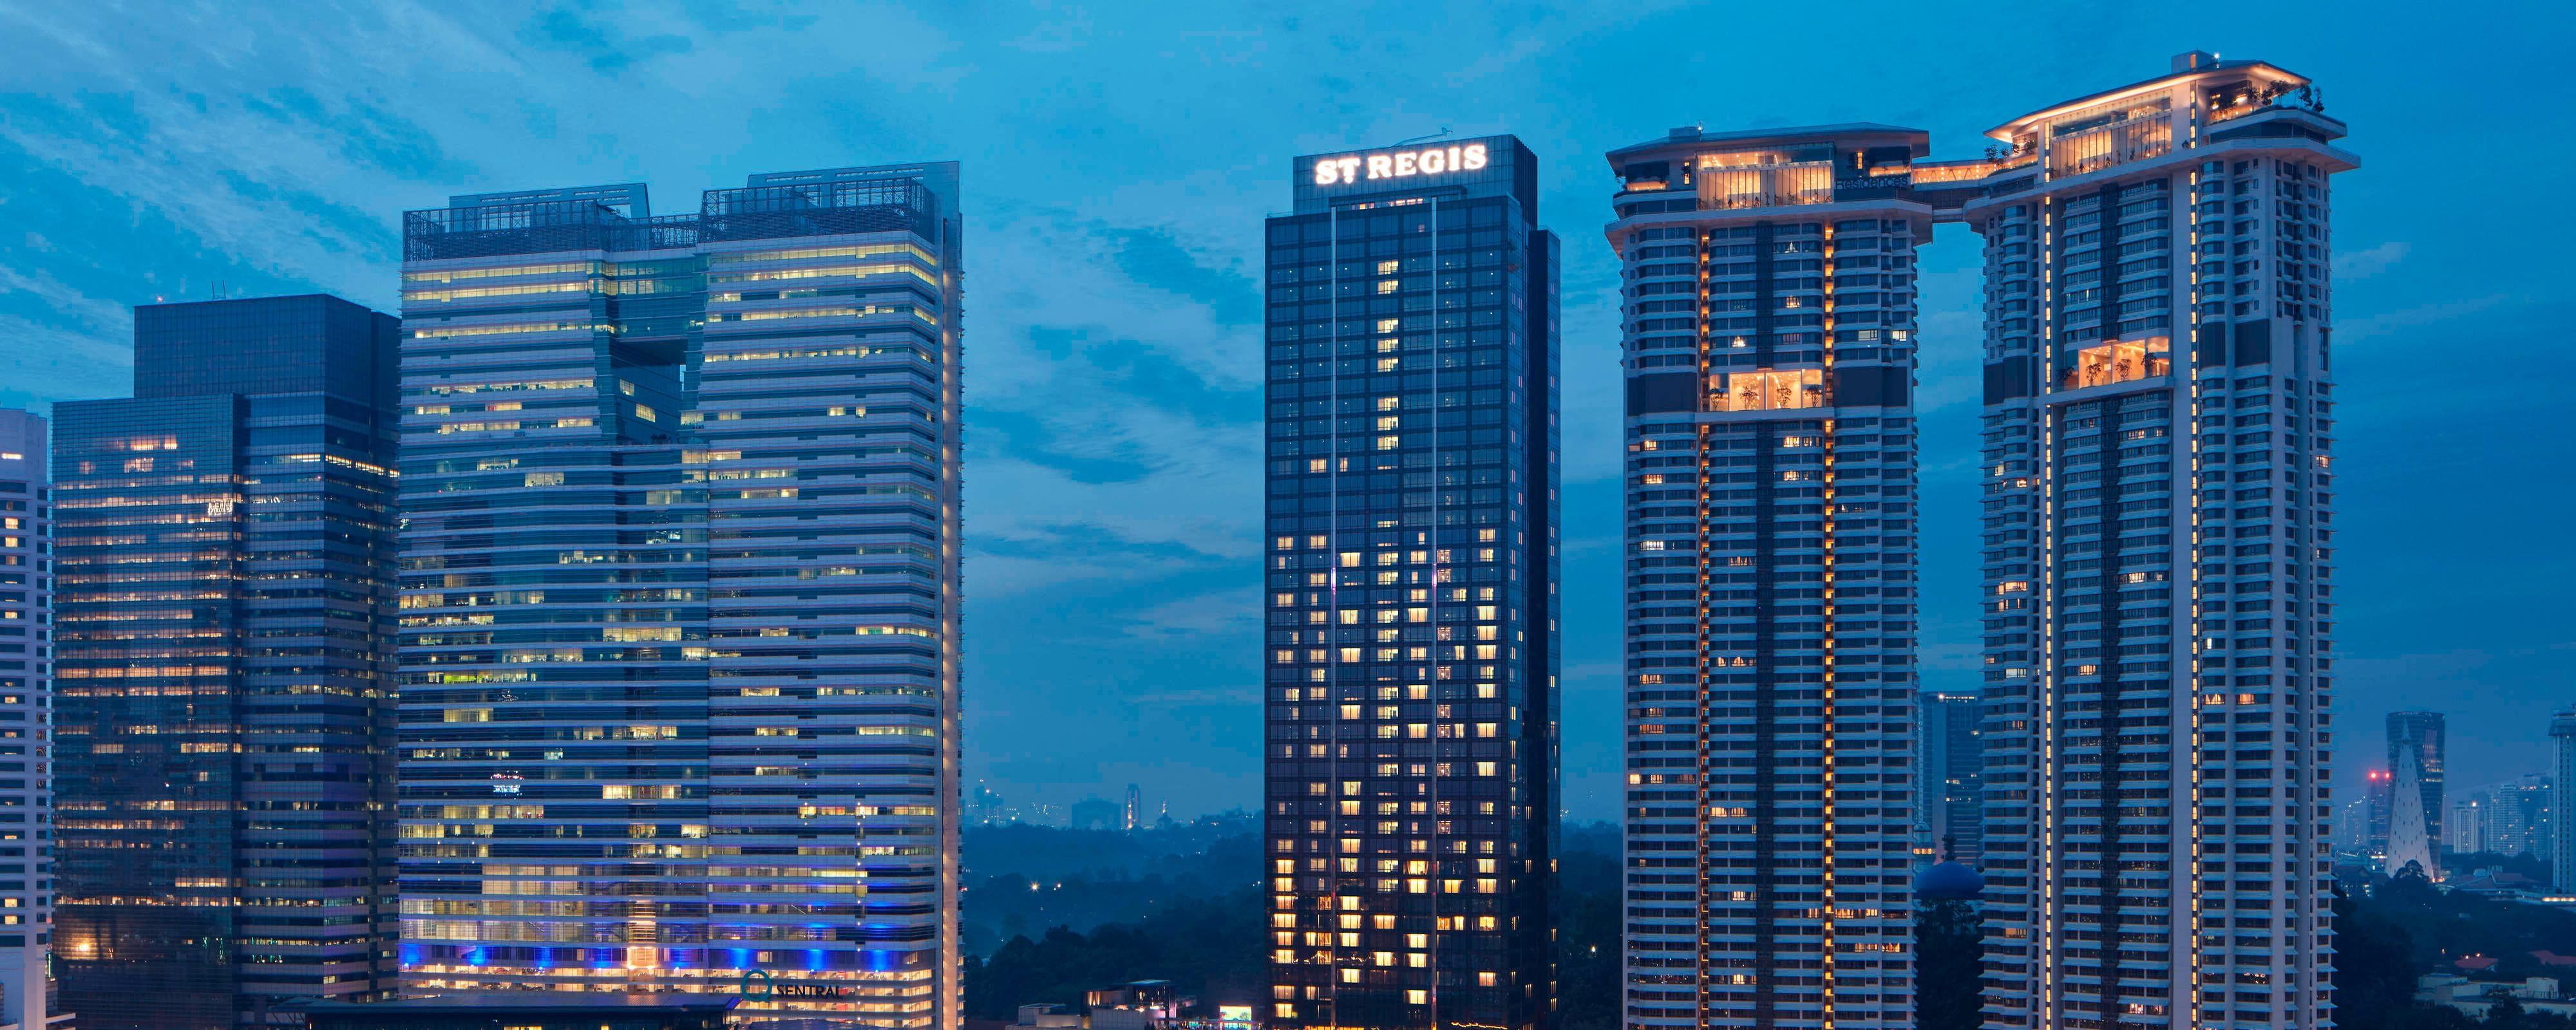 Luxury Hotels in Kuala Lumpur Malaysia | The St. Regis Kuala Lumpur